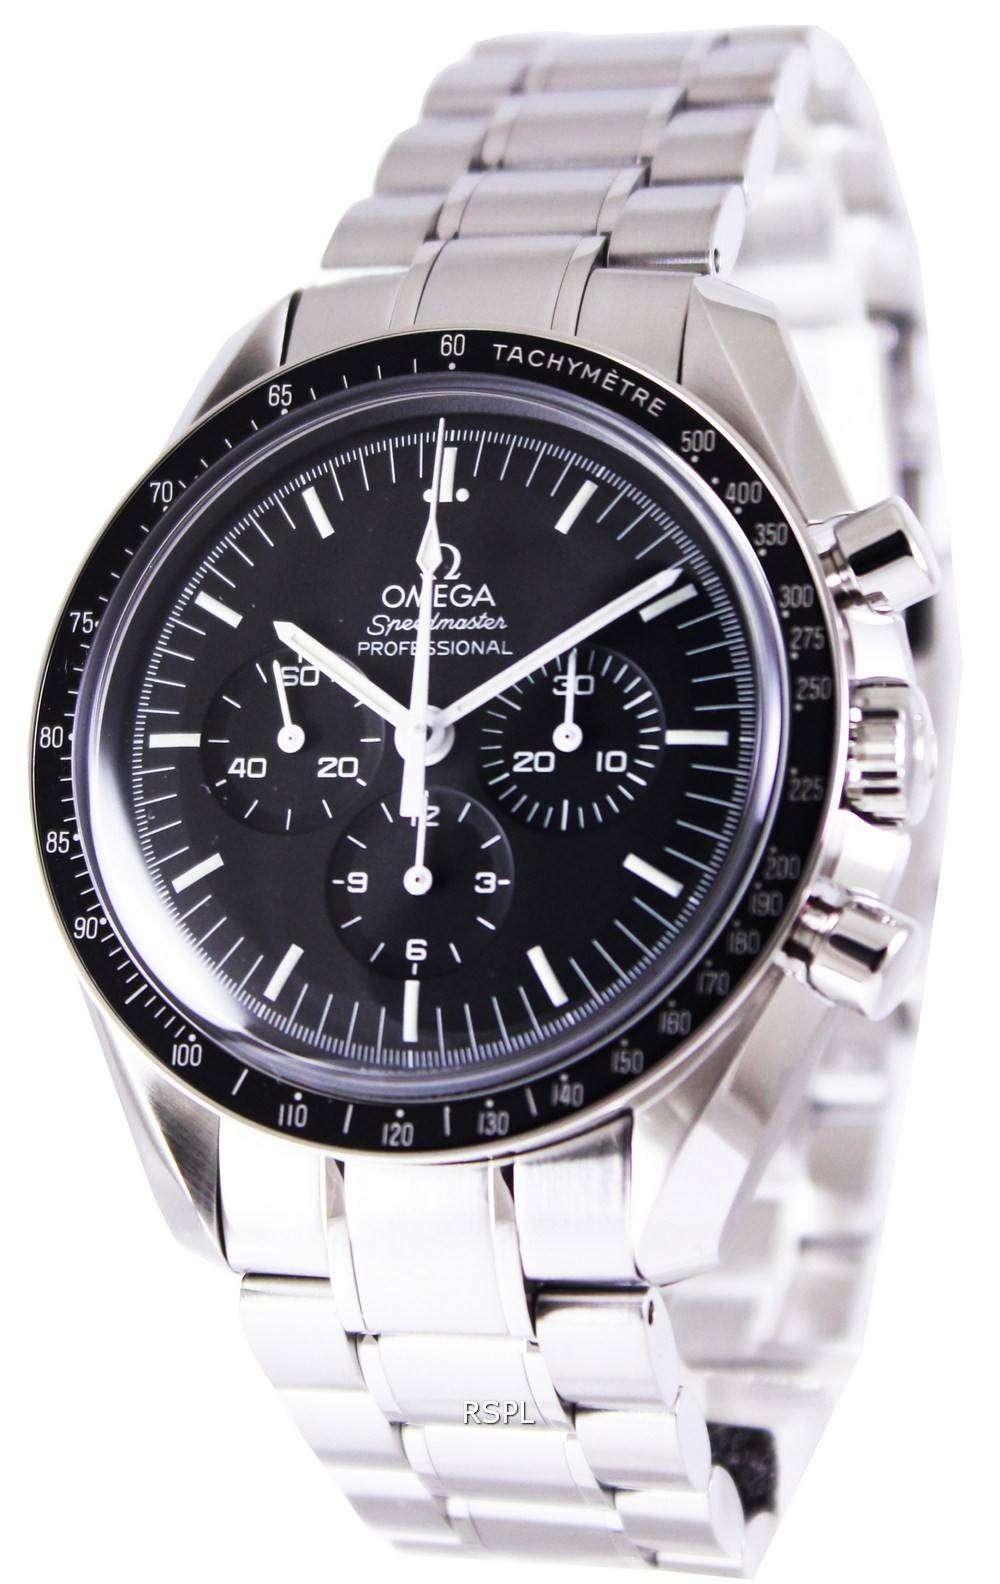 omega speedmaster professional chronograph moonwatch 3570. Black Bedroom Furniture Sets. Home Design Ideas